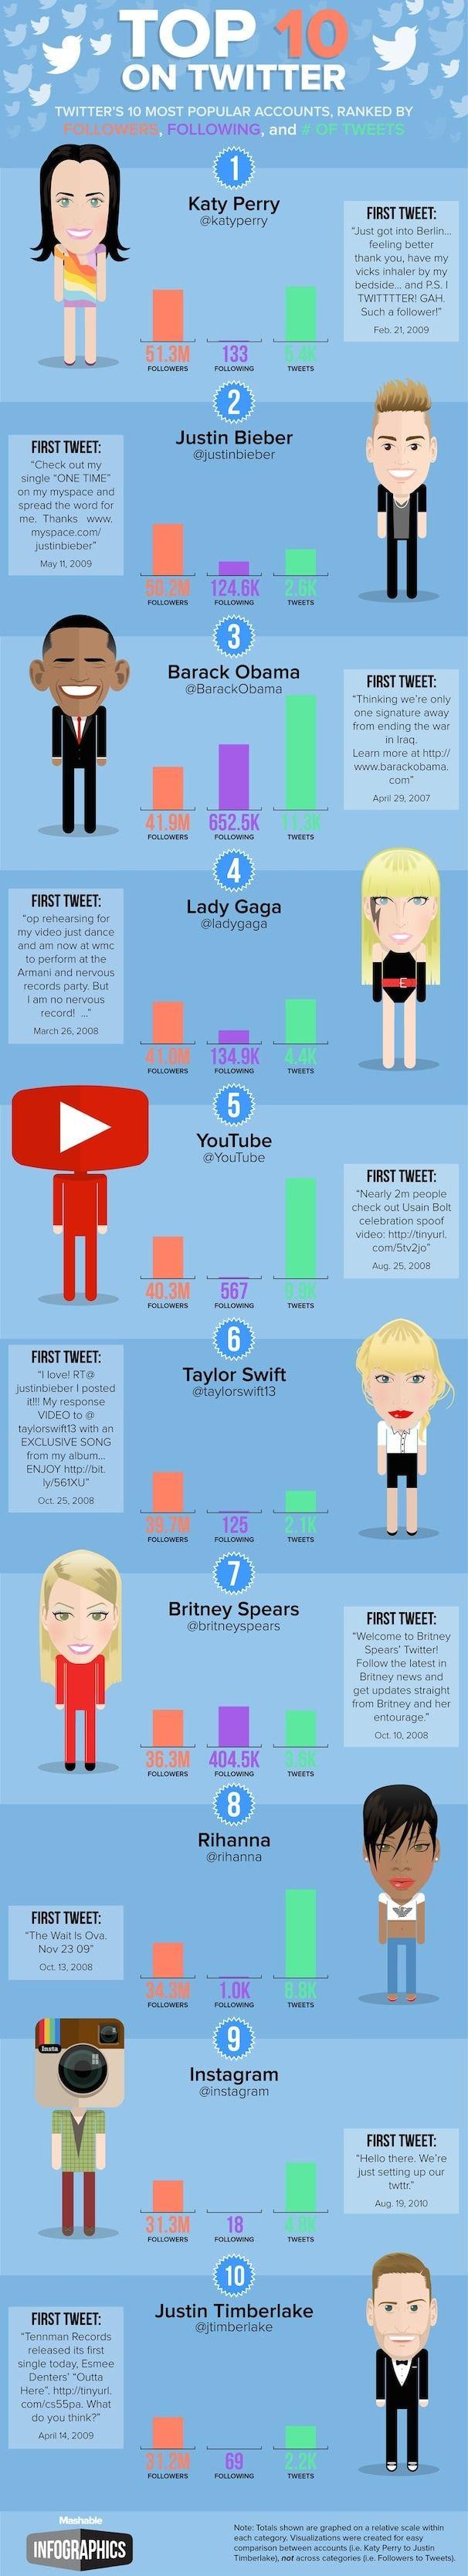 Top 10 пользователей Twitter